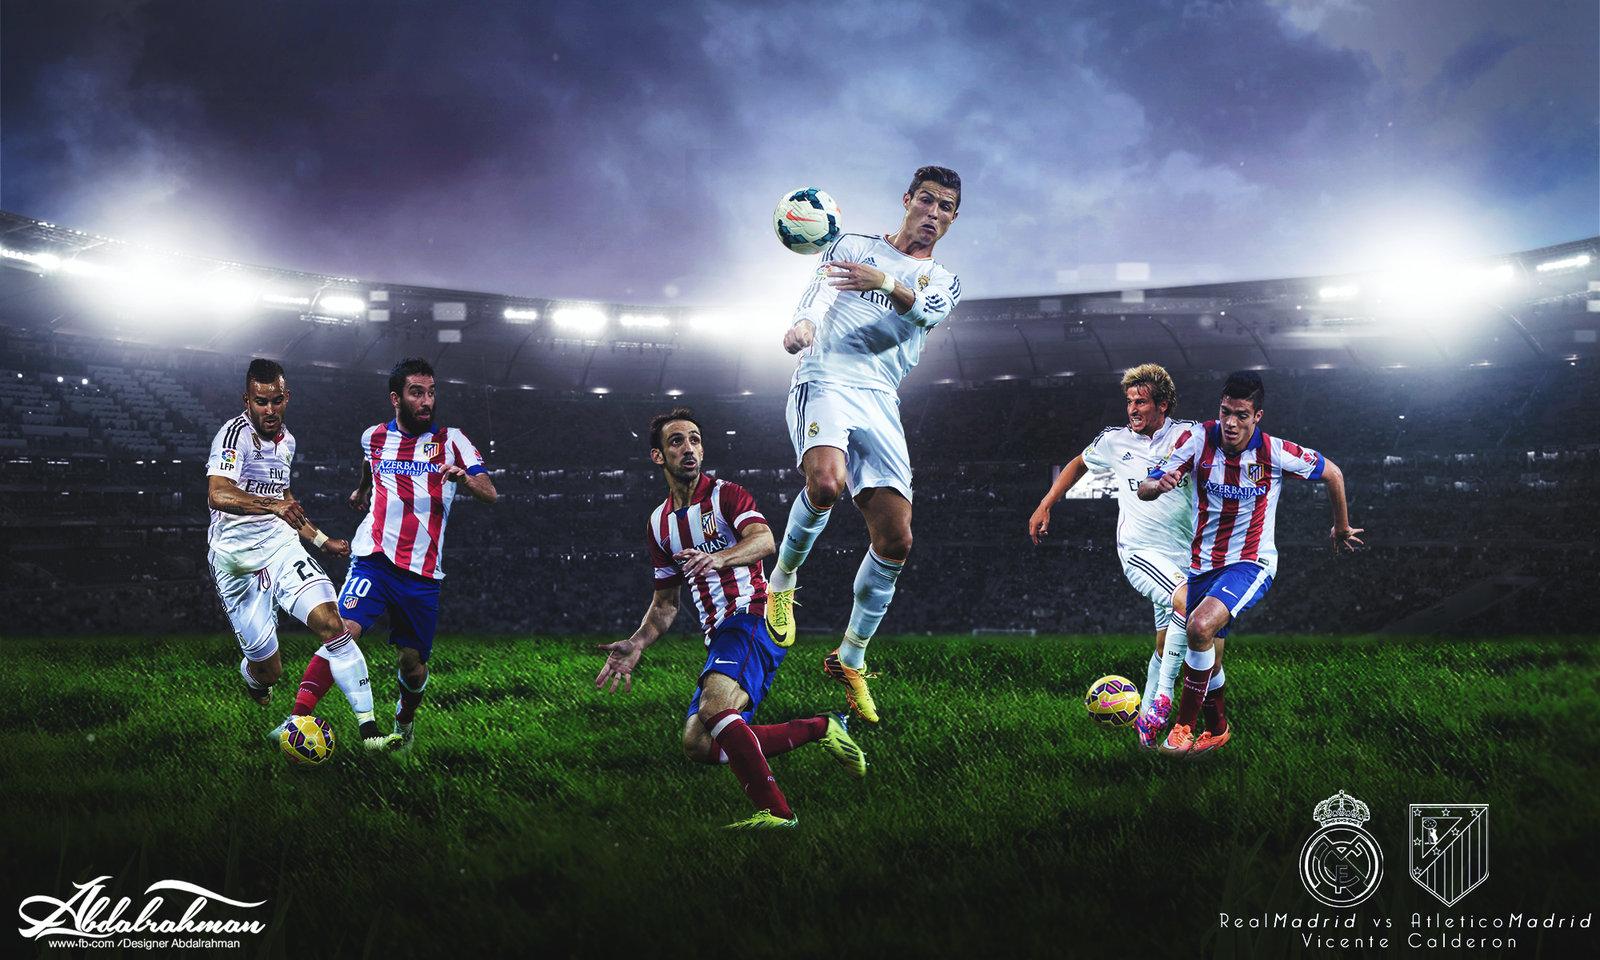 wallpaper real madrid vs atletico madrid 2015 by Designer 1600x960